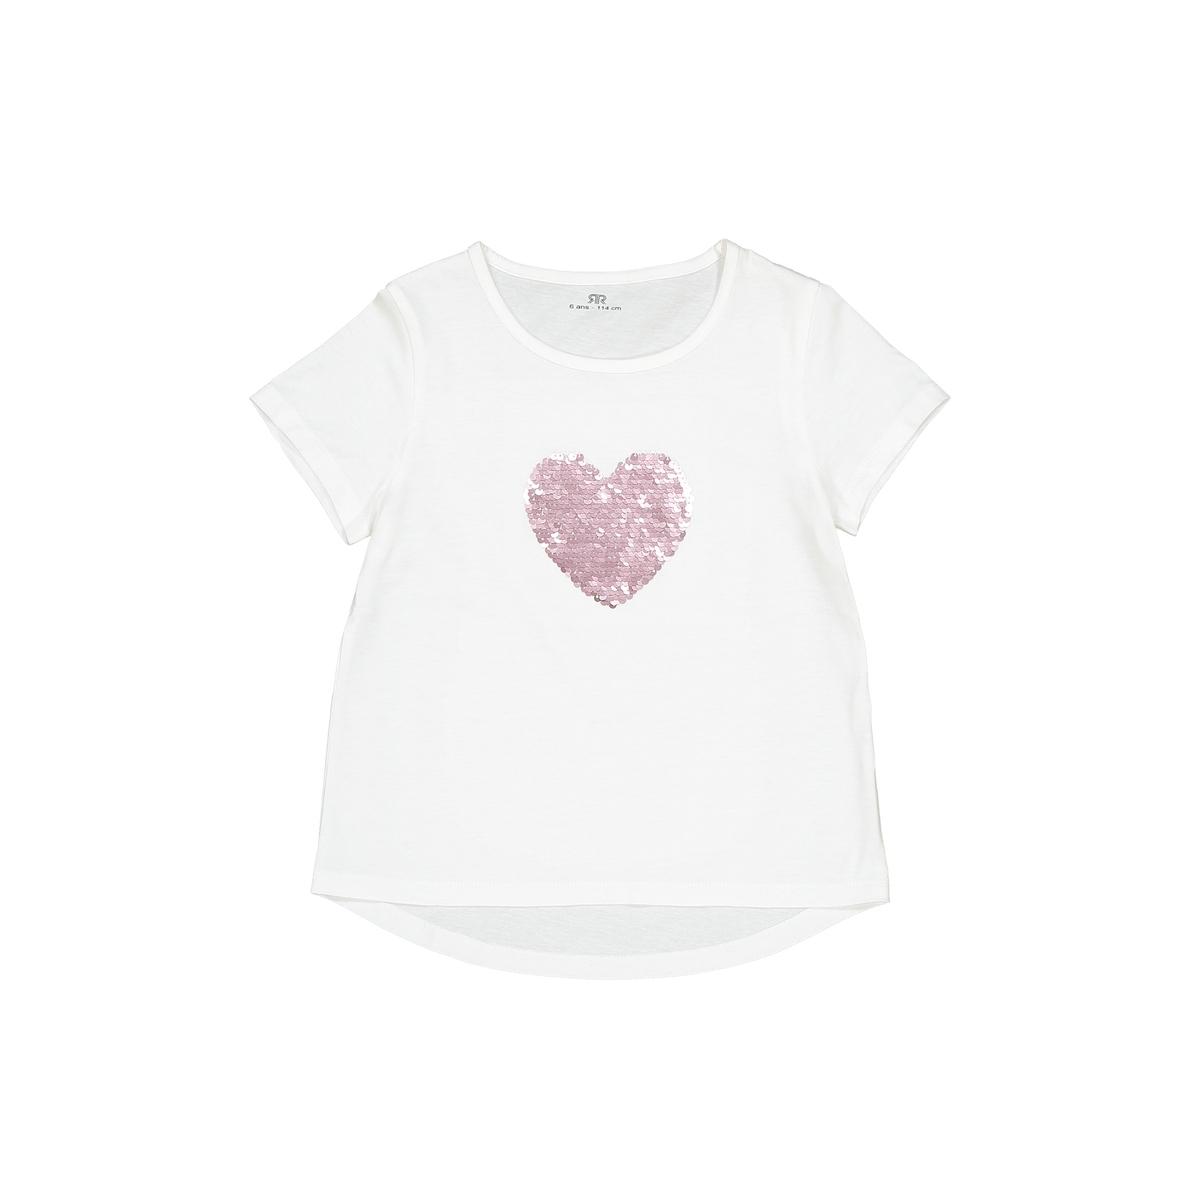 "T-shirt ""cuore"" in paillettes double face da 3 a 12 anni"